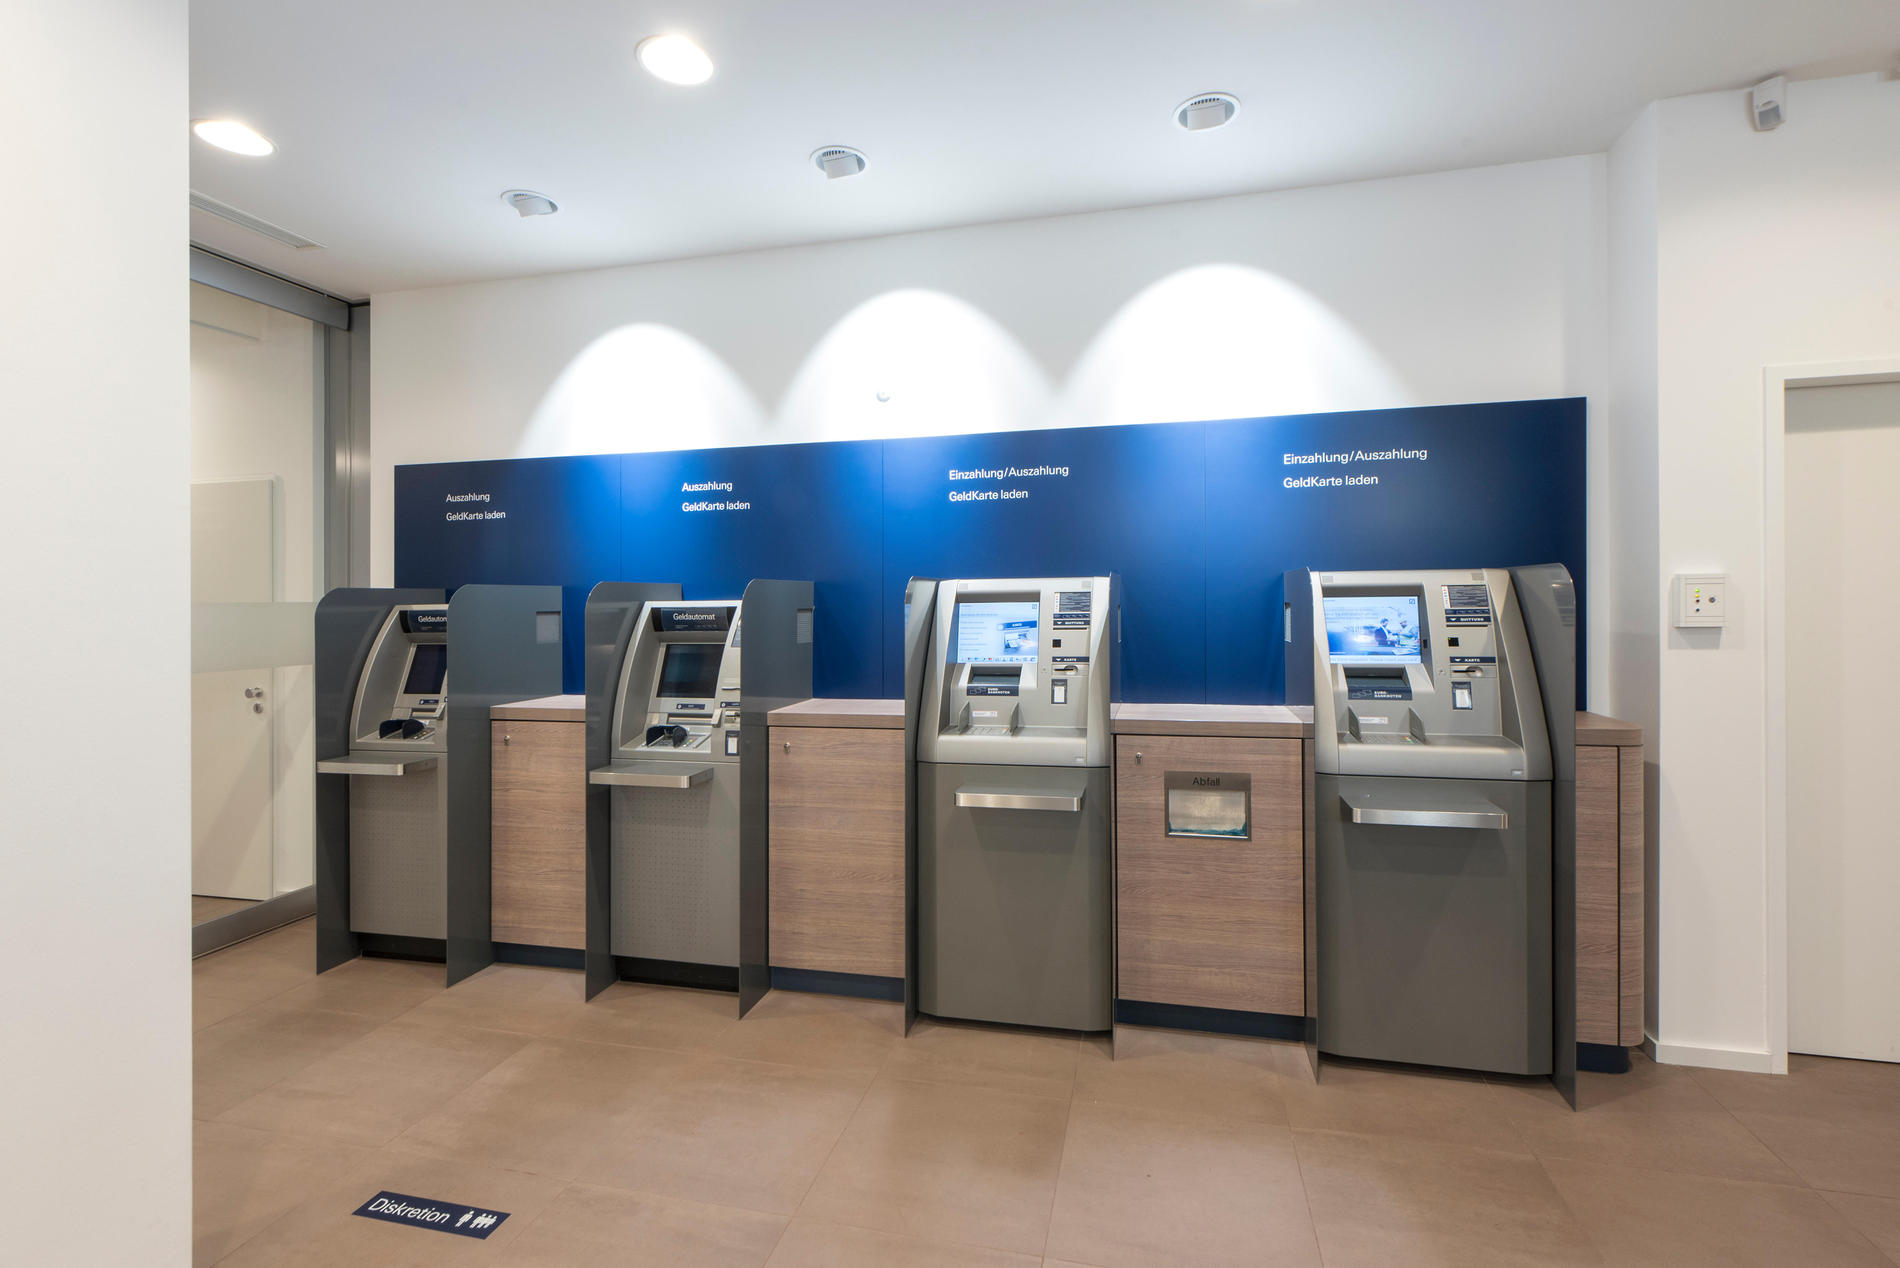 Deutsche Bank Filiale In Berlin In Das Ortliche